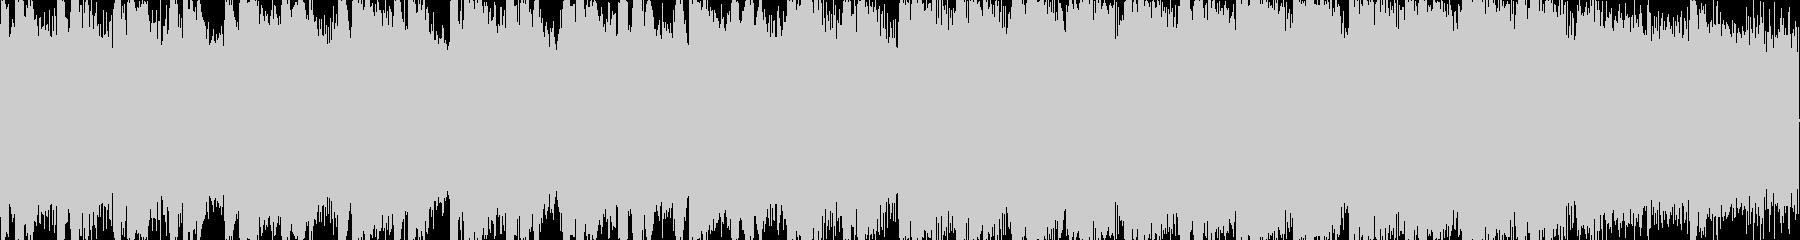 EDMループデモ1の未再生の波形